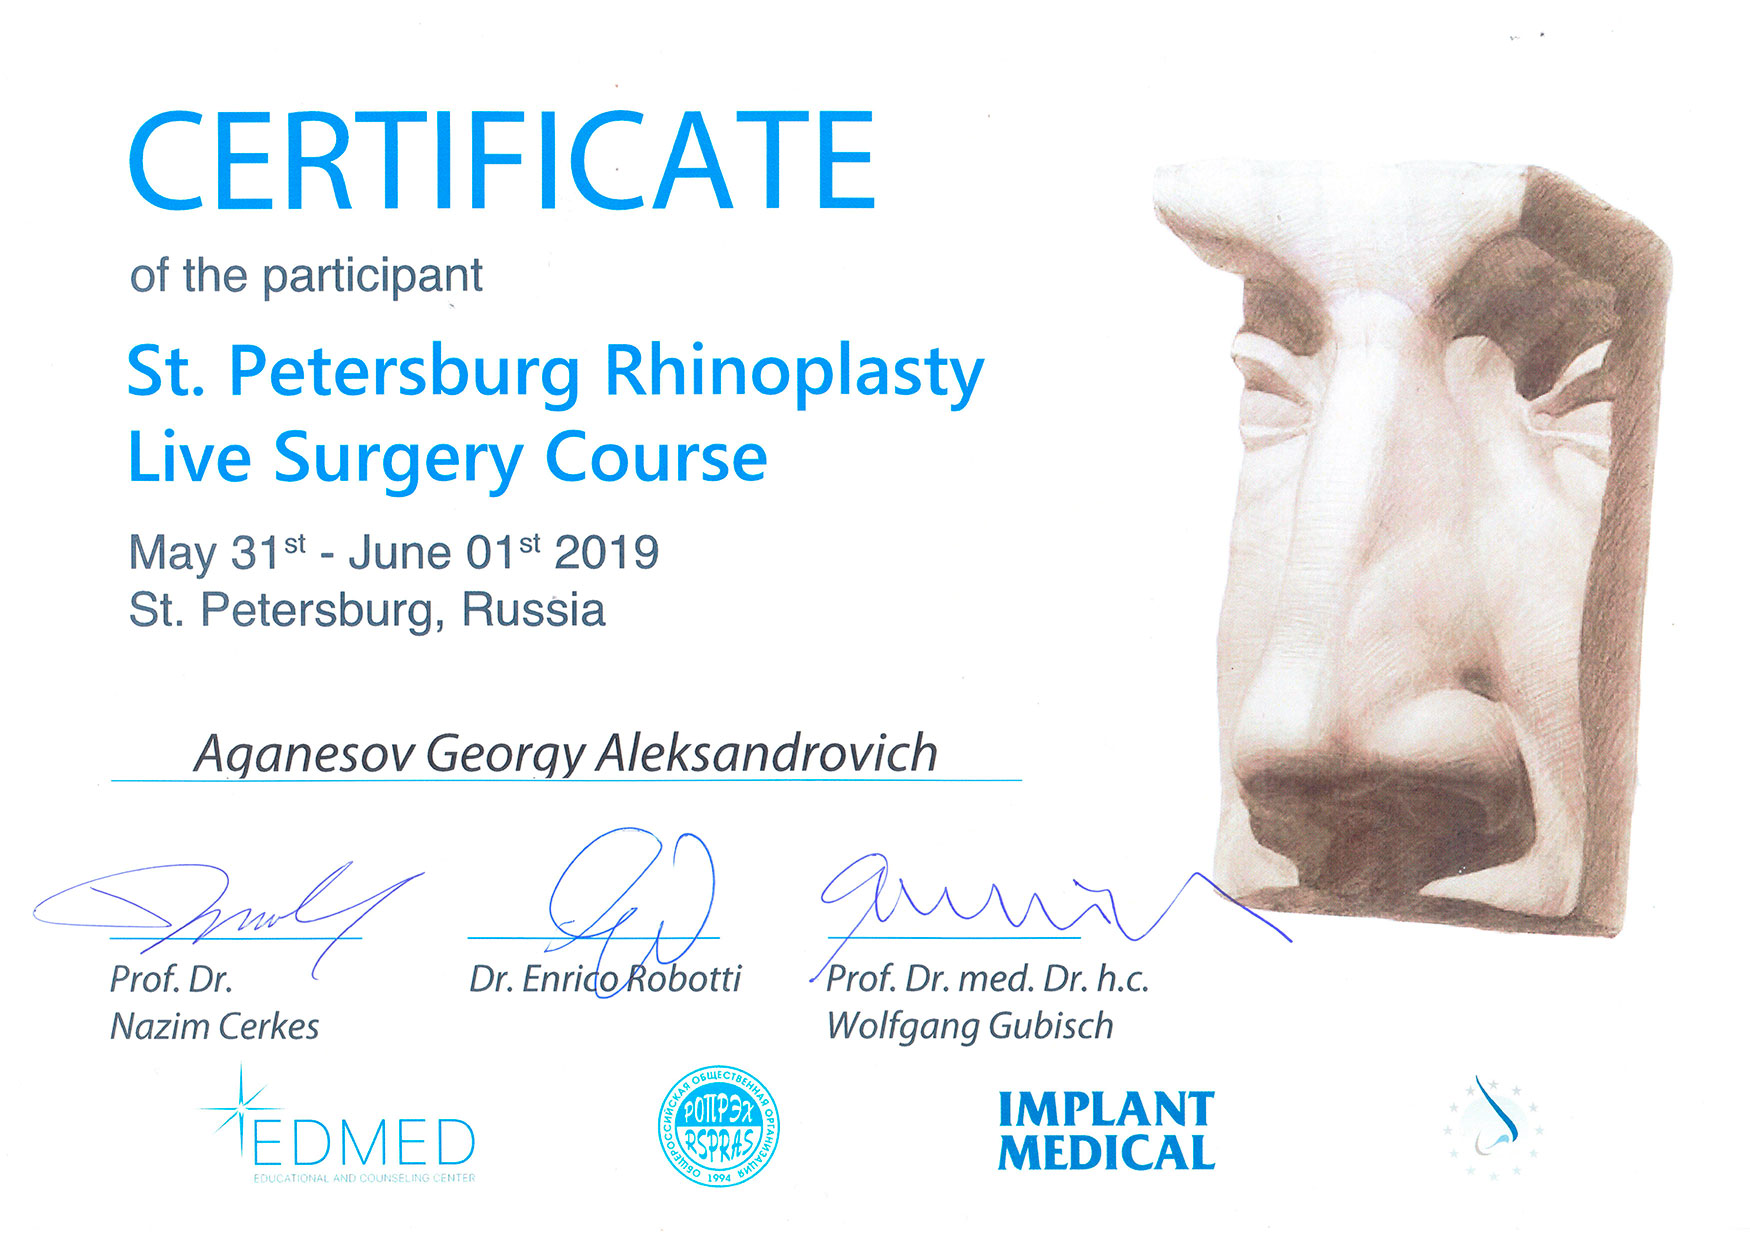 Санкт-Петербургский live-surgery курс по ринопластике